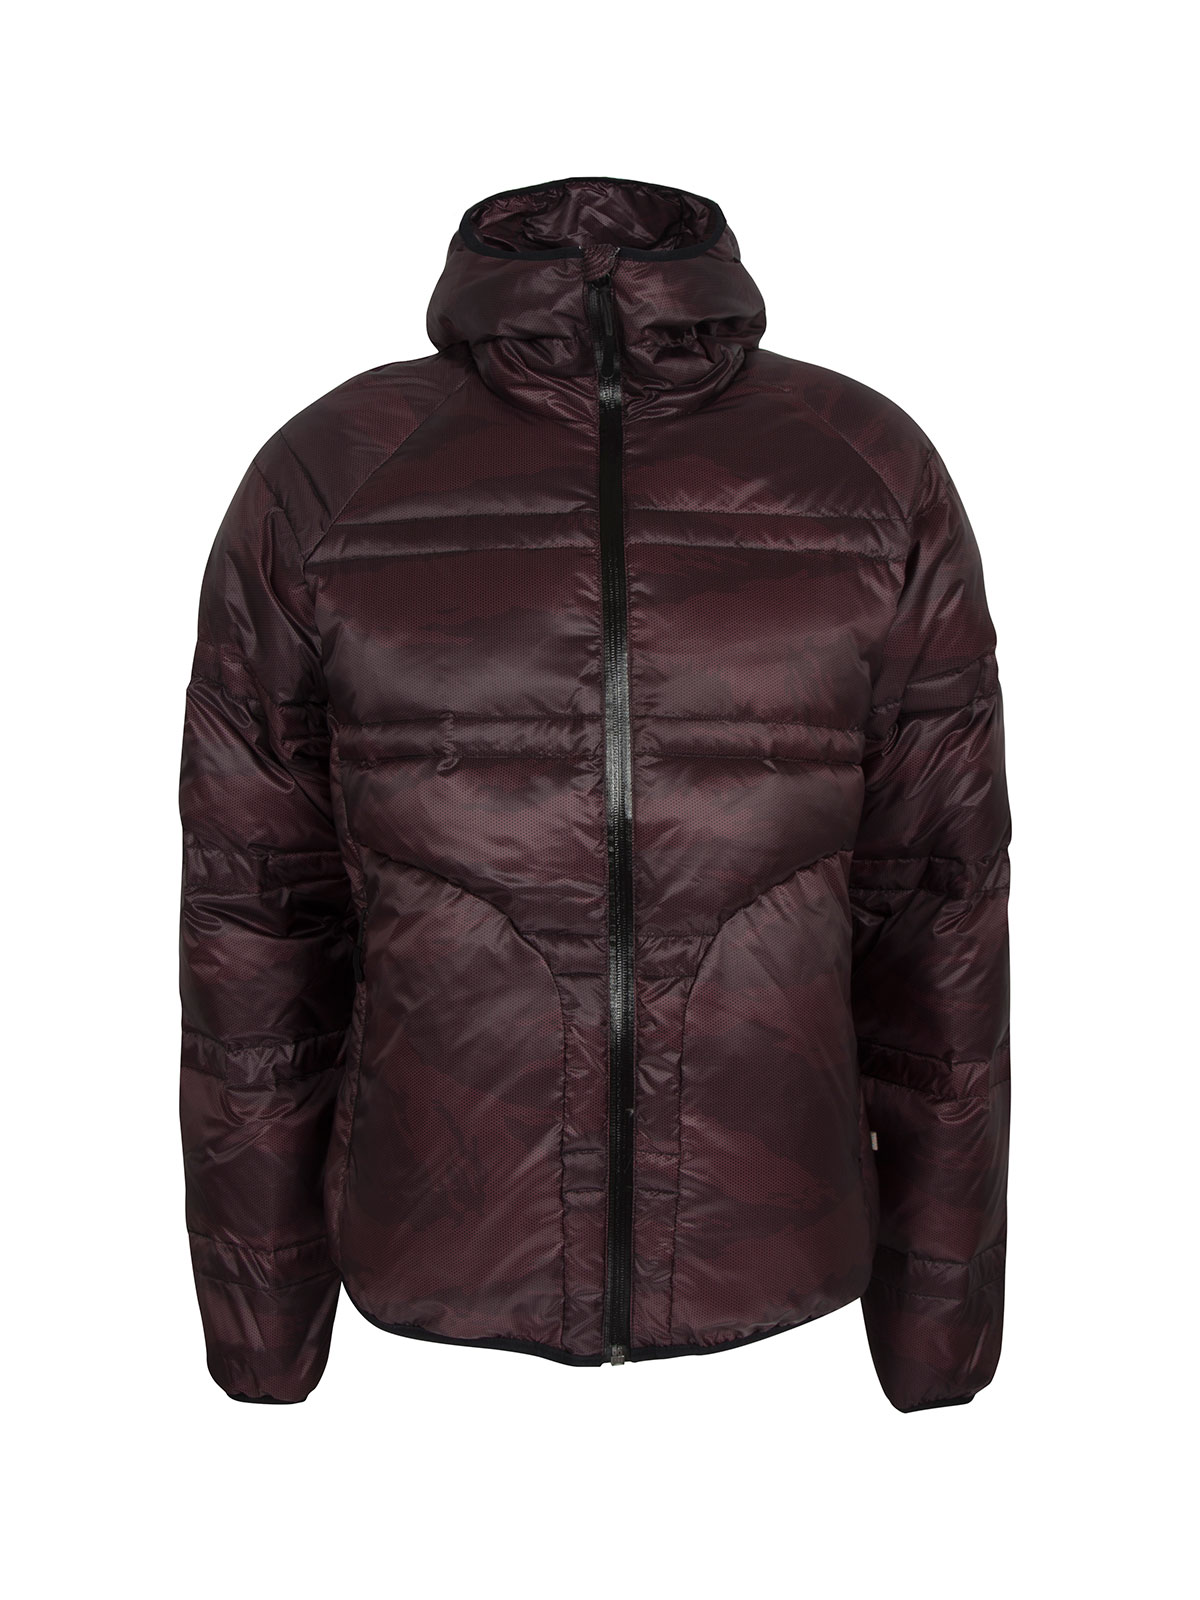 Mens Coats Autumn/Winter 2014 - Dublin Fashion Festival